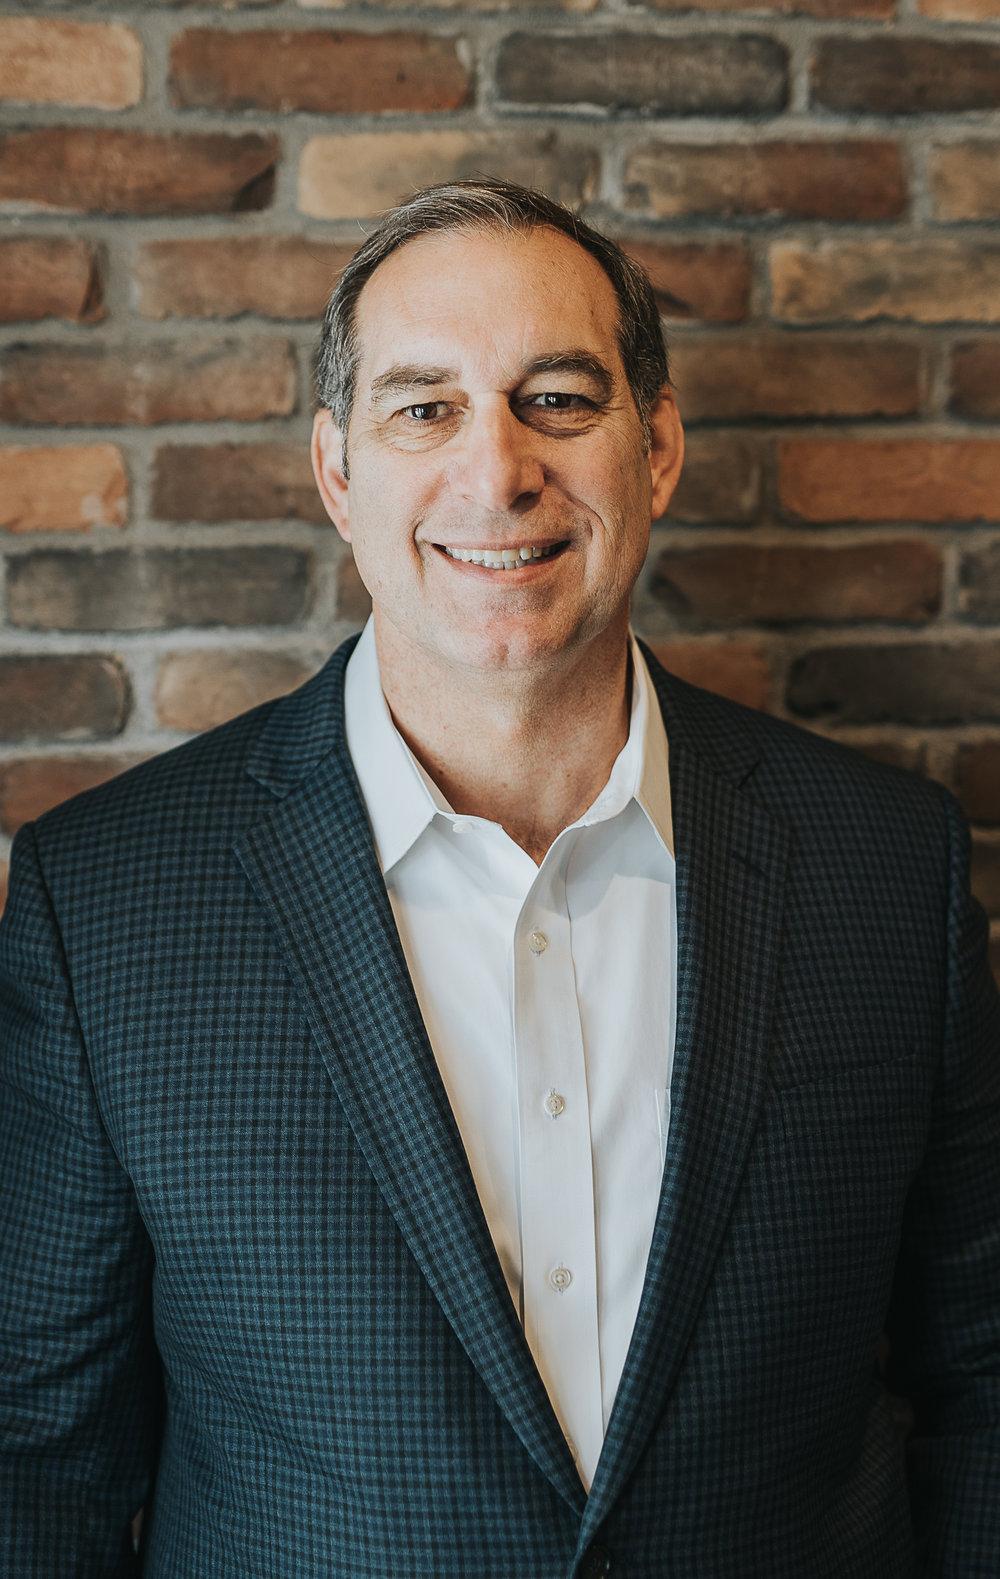 John Gesek, Financial Advisor & Principal